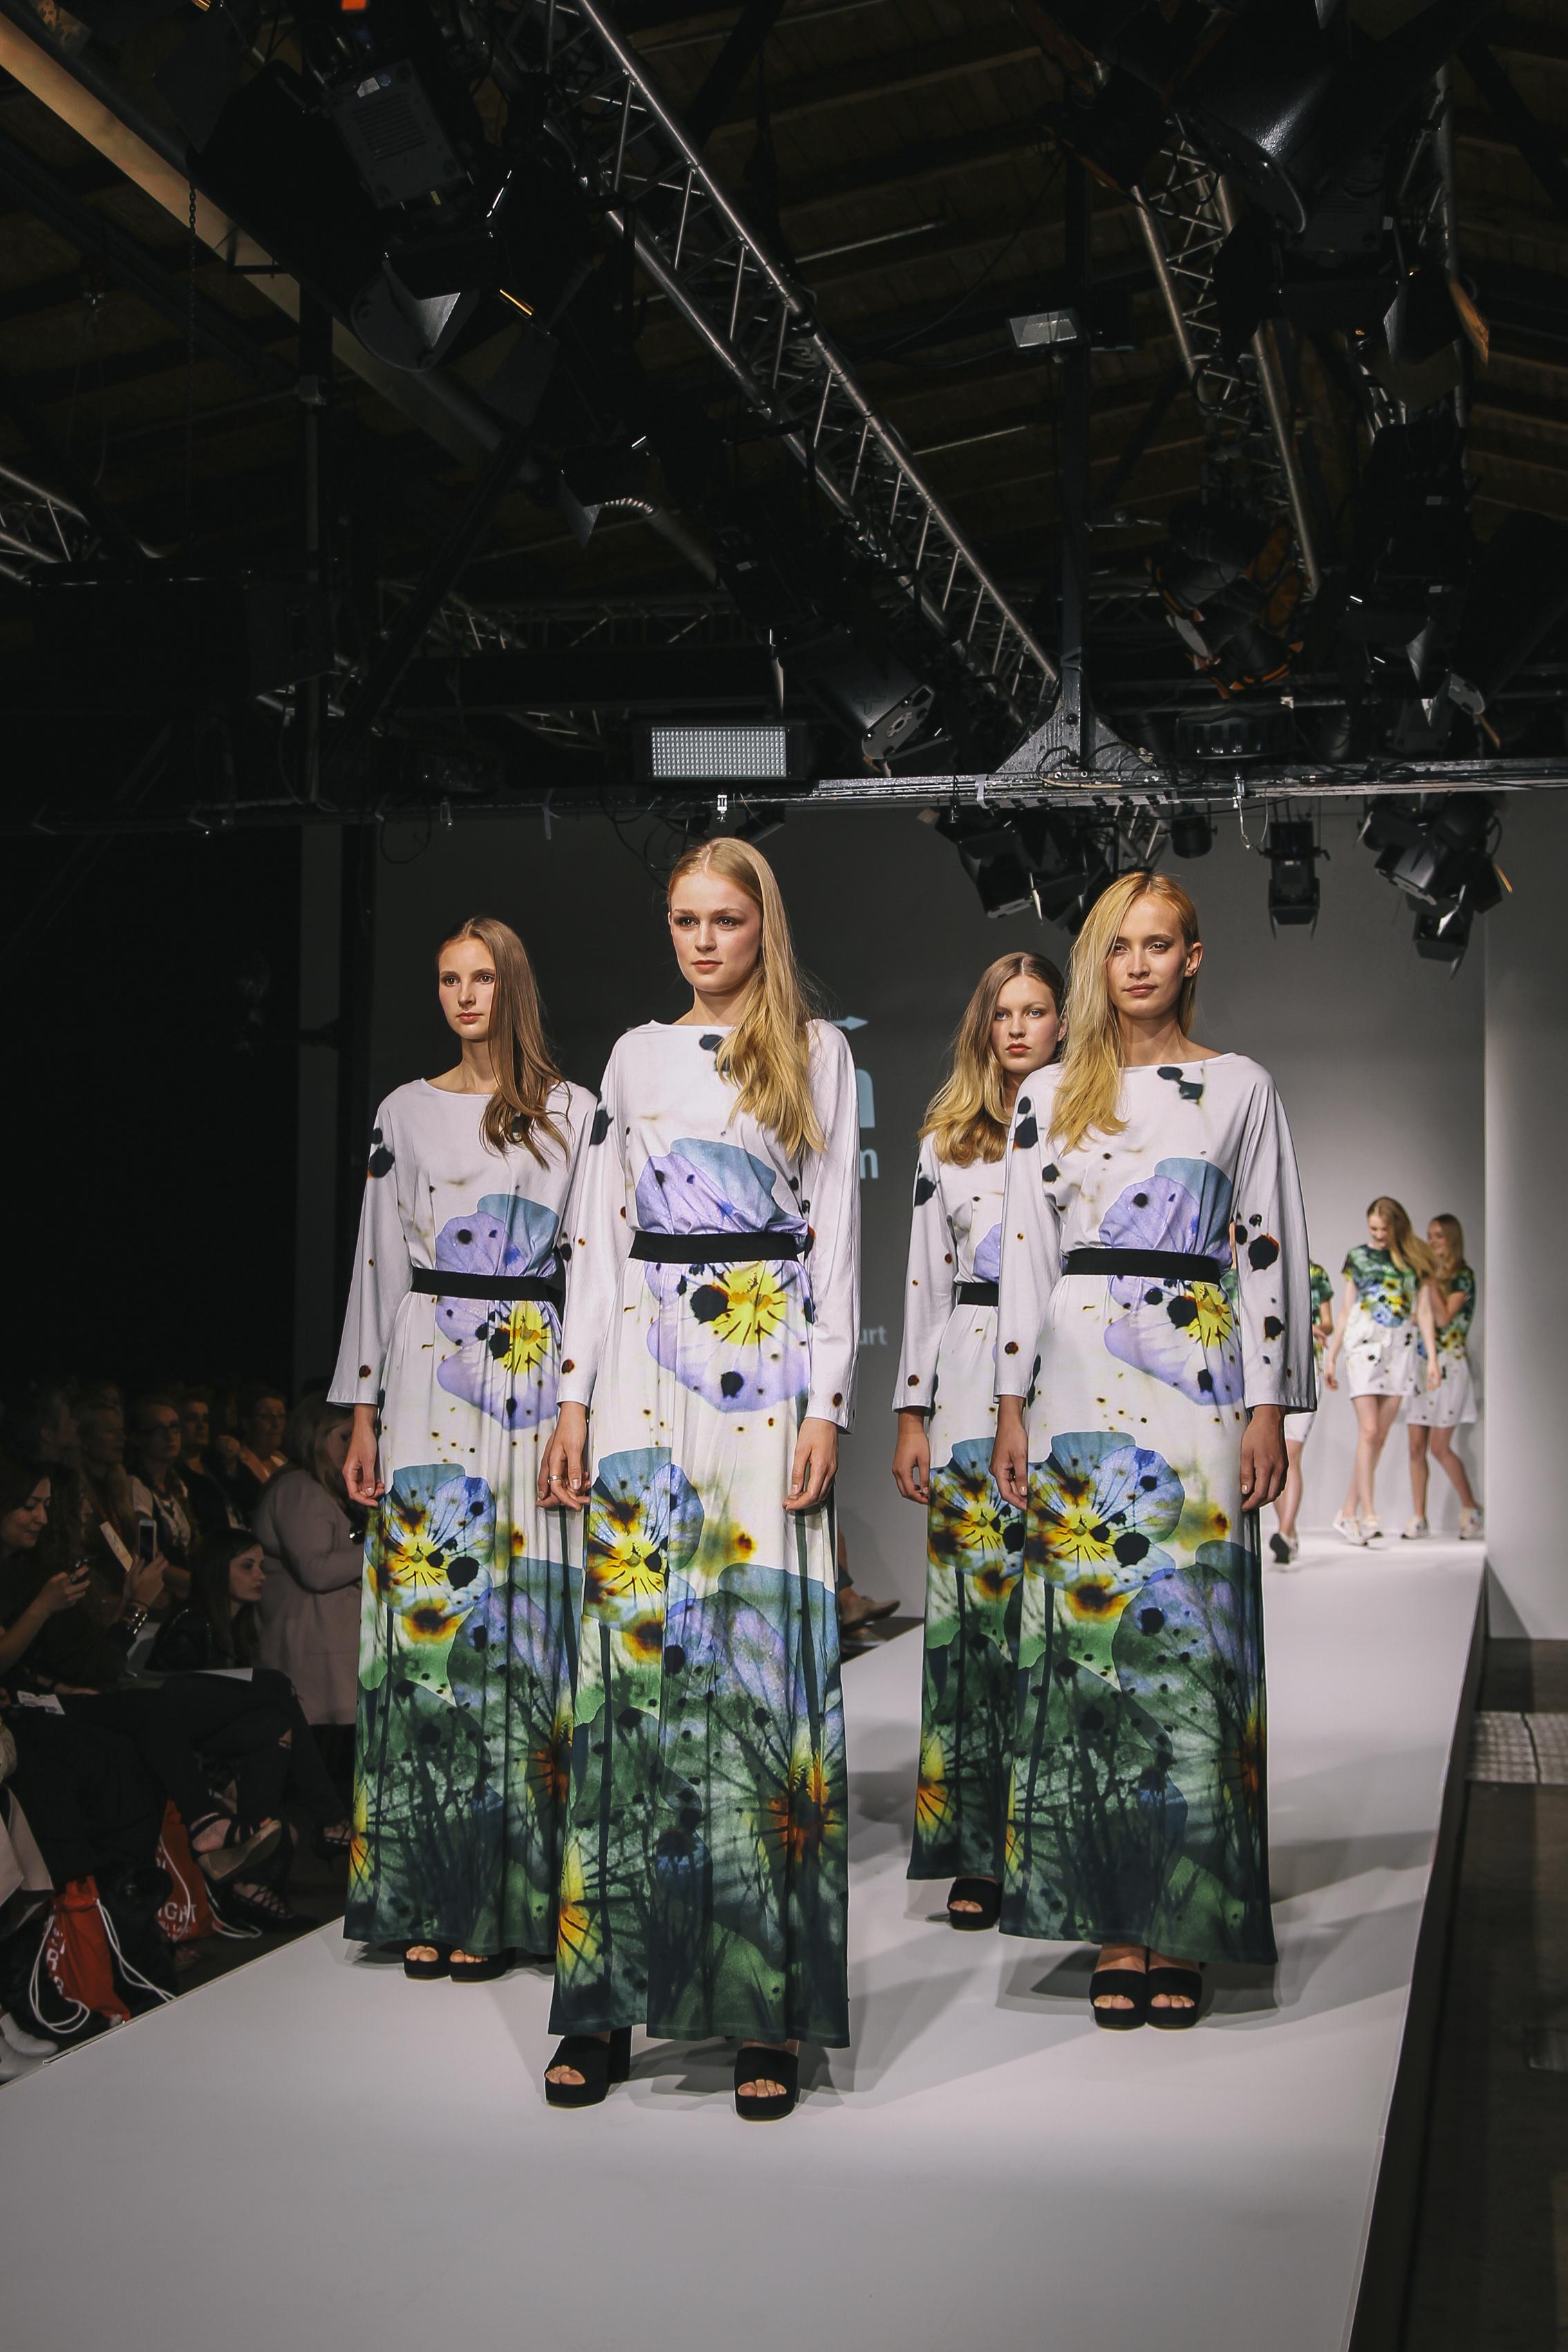 greenshowroom-salonshow-lanius-weleda-fashion-week